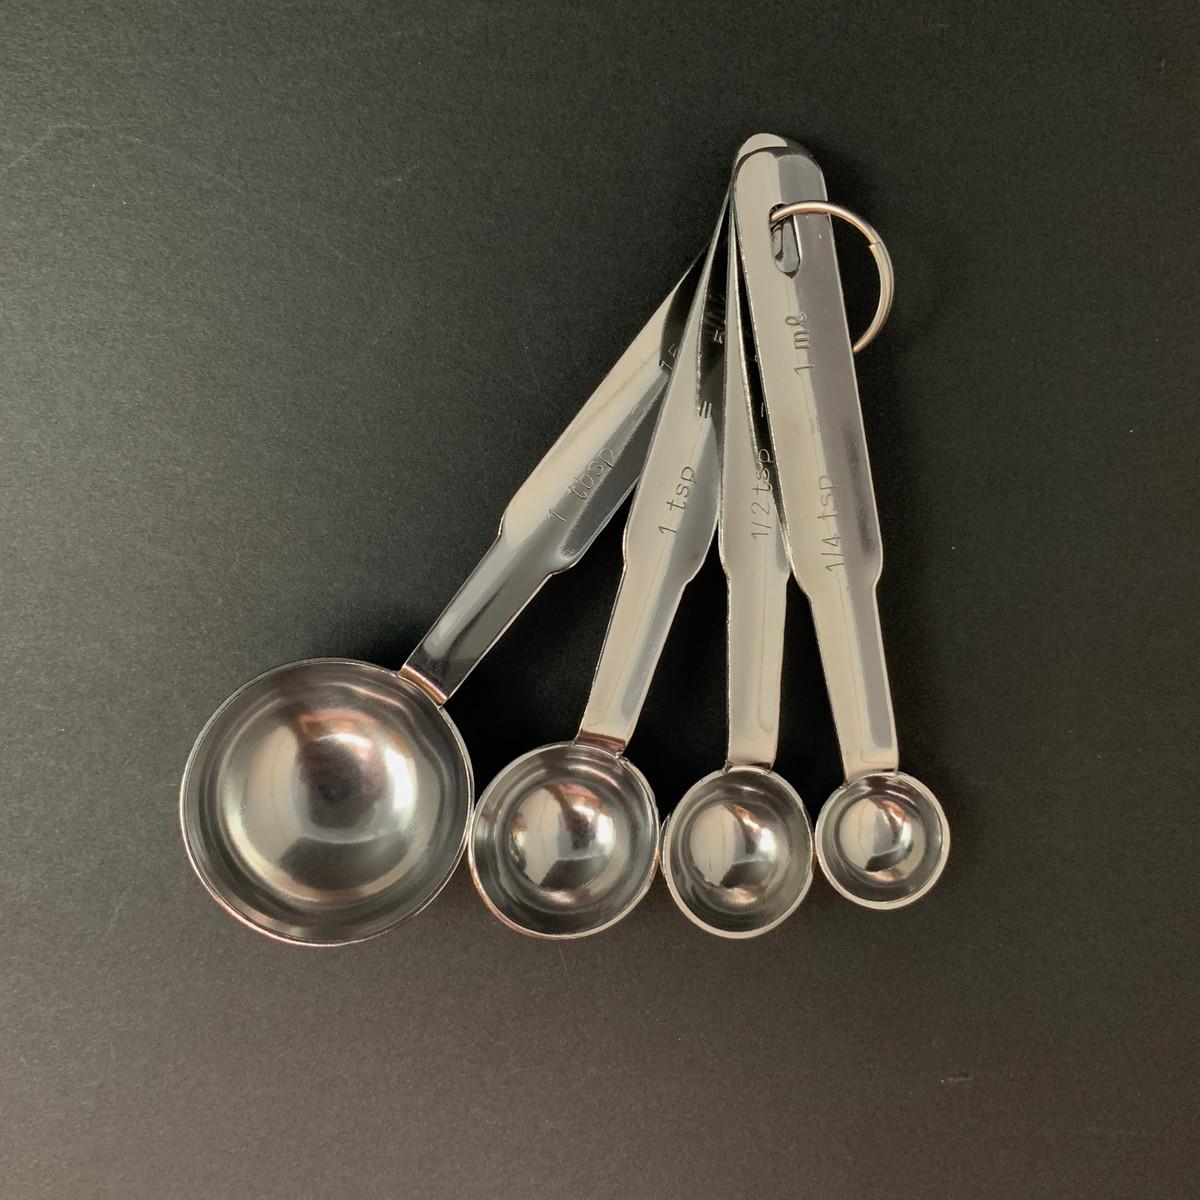 Matfer Bourgeat | Measuring Spoons